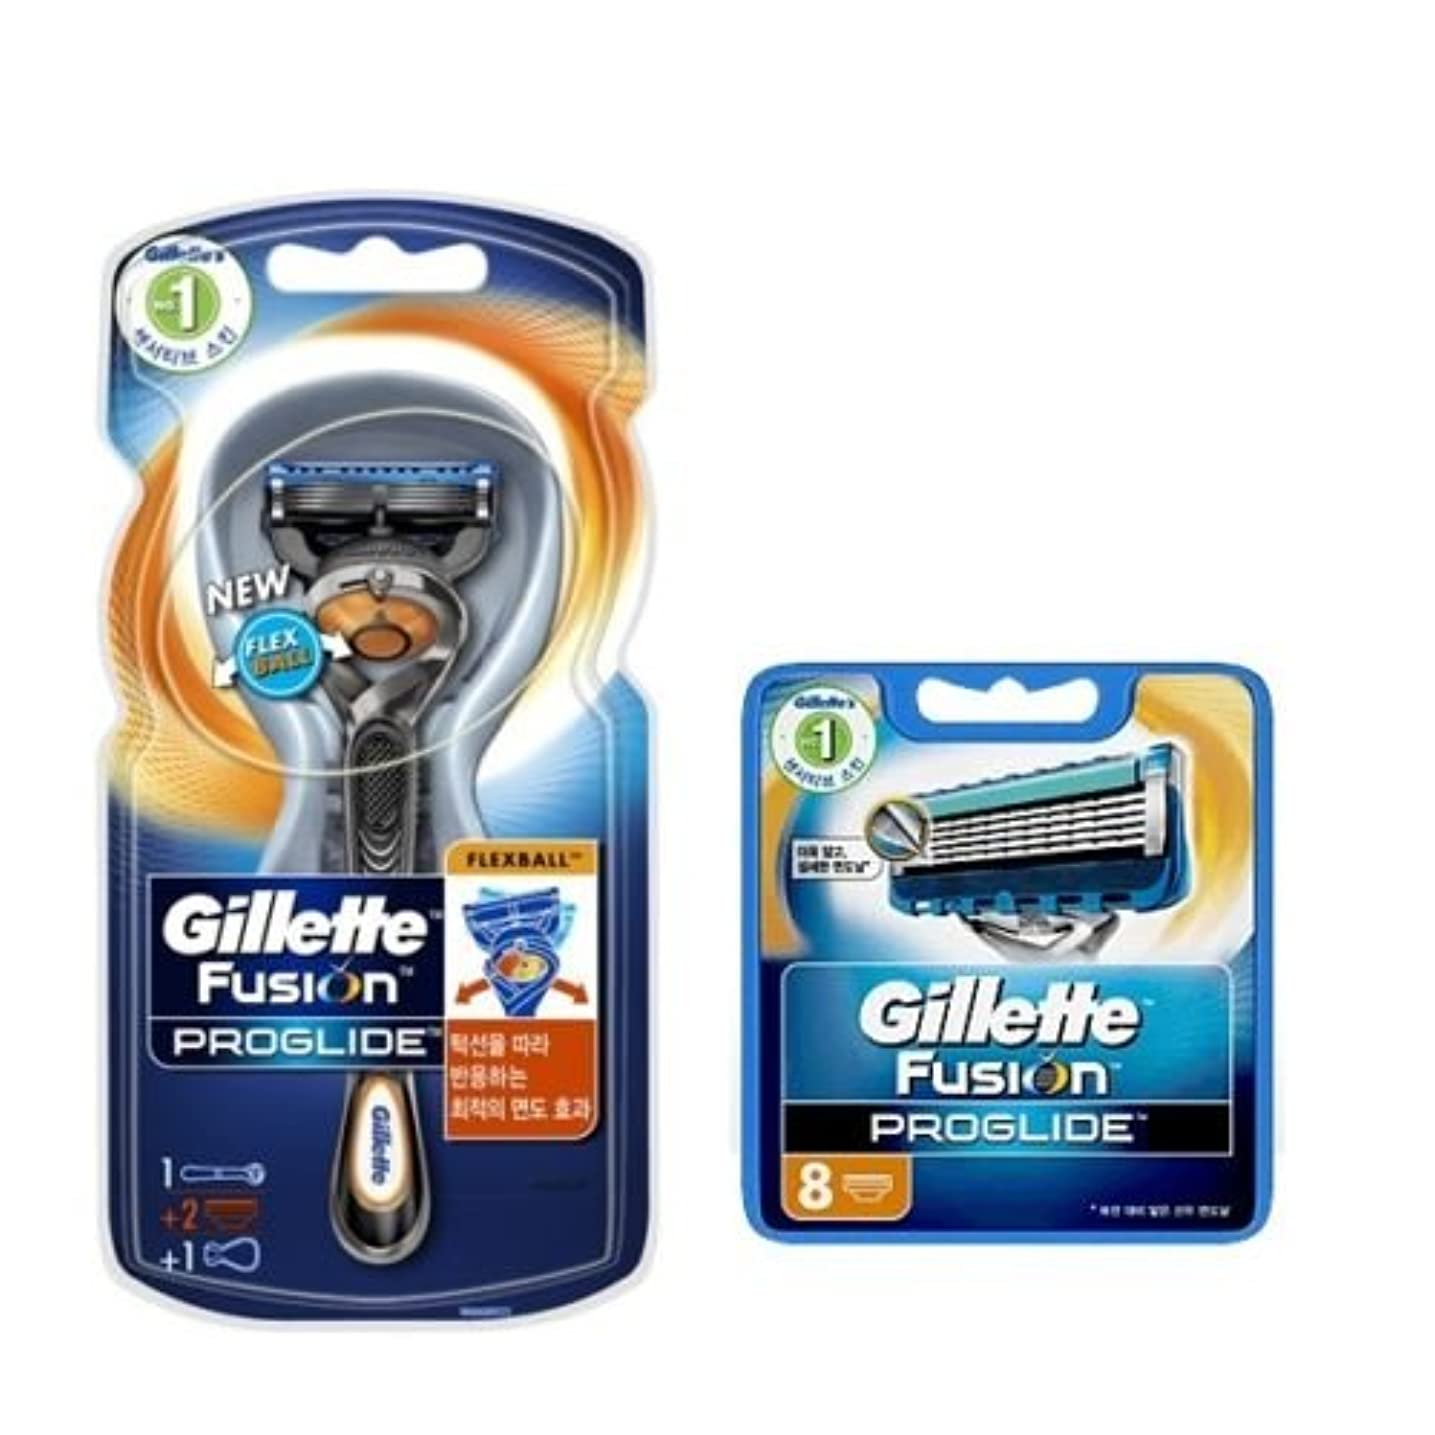 Gillette Fusion Proglide Flexball Manual メンズ1剃刀10剃刀刃 [並行輸入品]